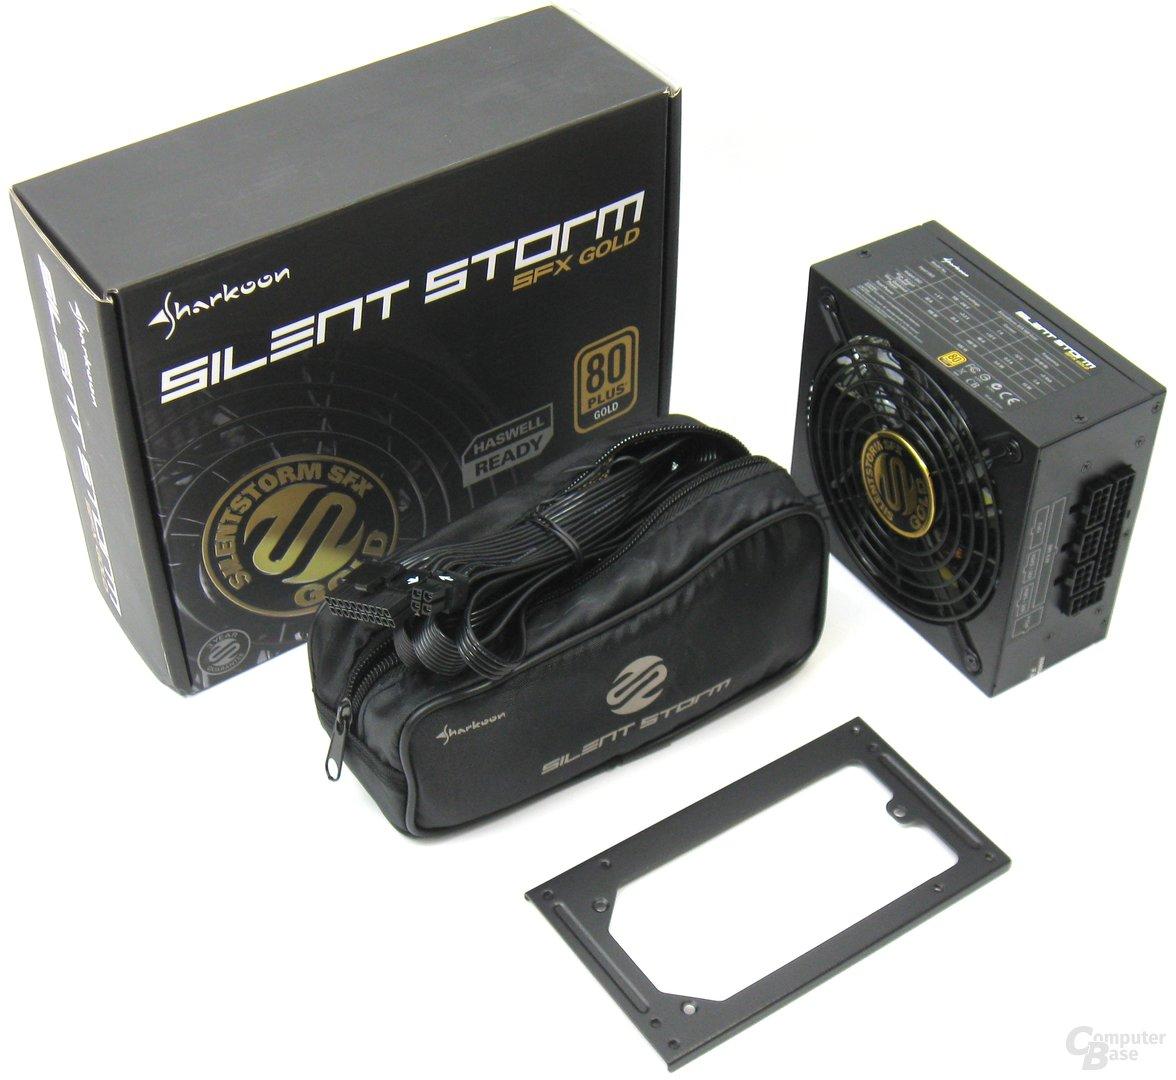 Sharkoon SilentStorm SFX Gold 500W